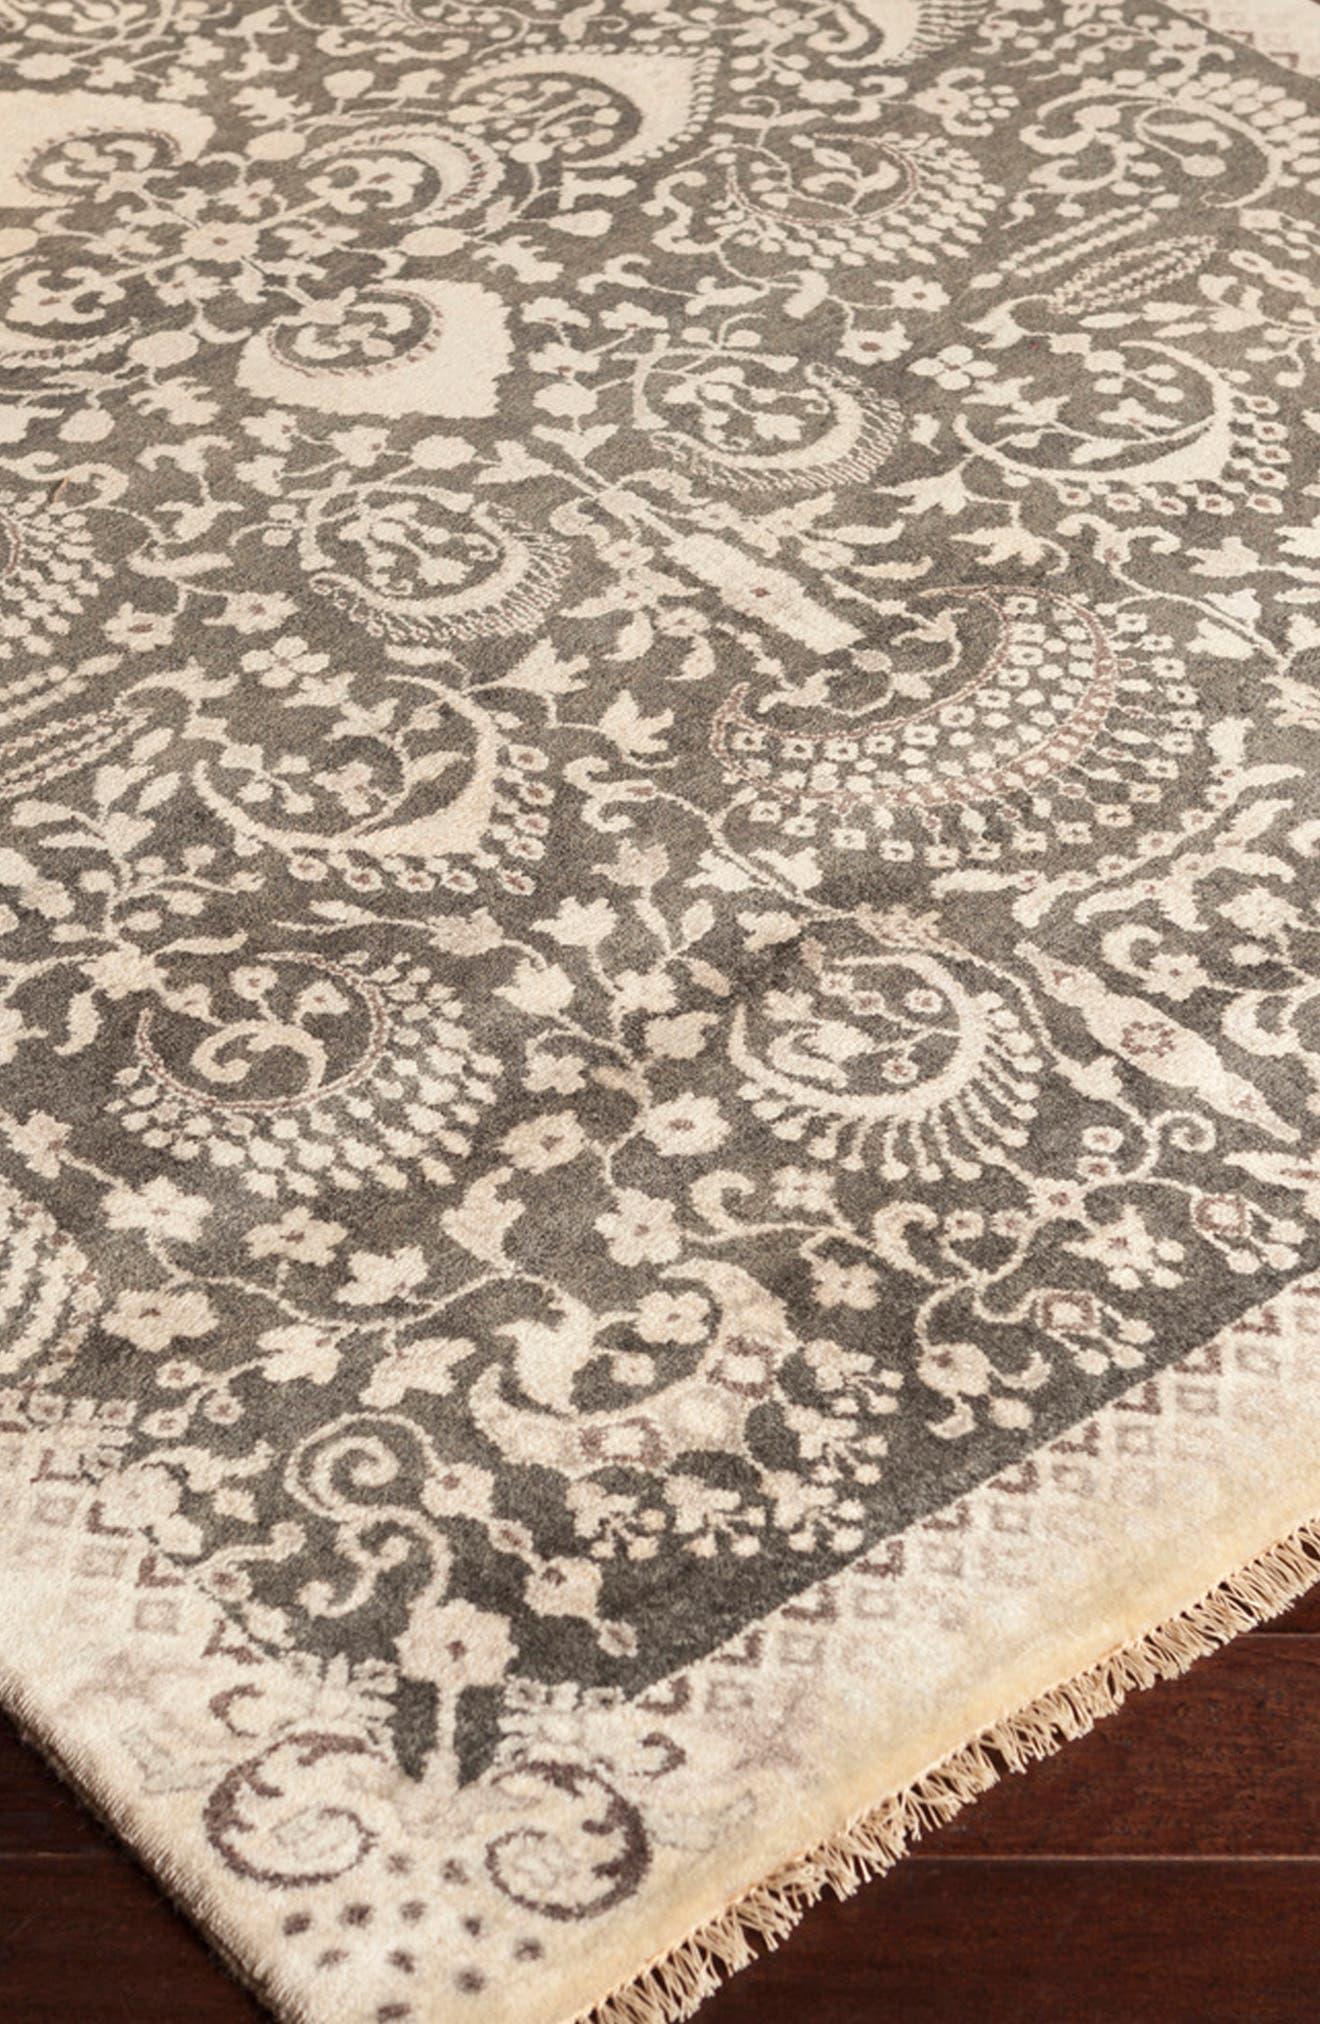 'Empress' Wool Rug,                             Alternate thumbnail 3, color,                             250